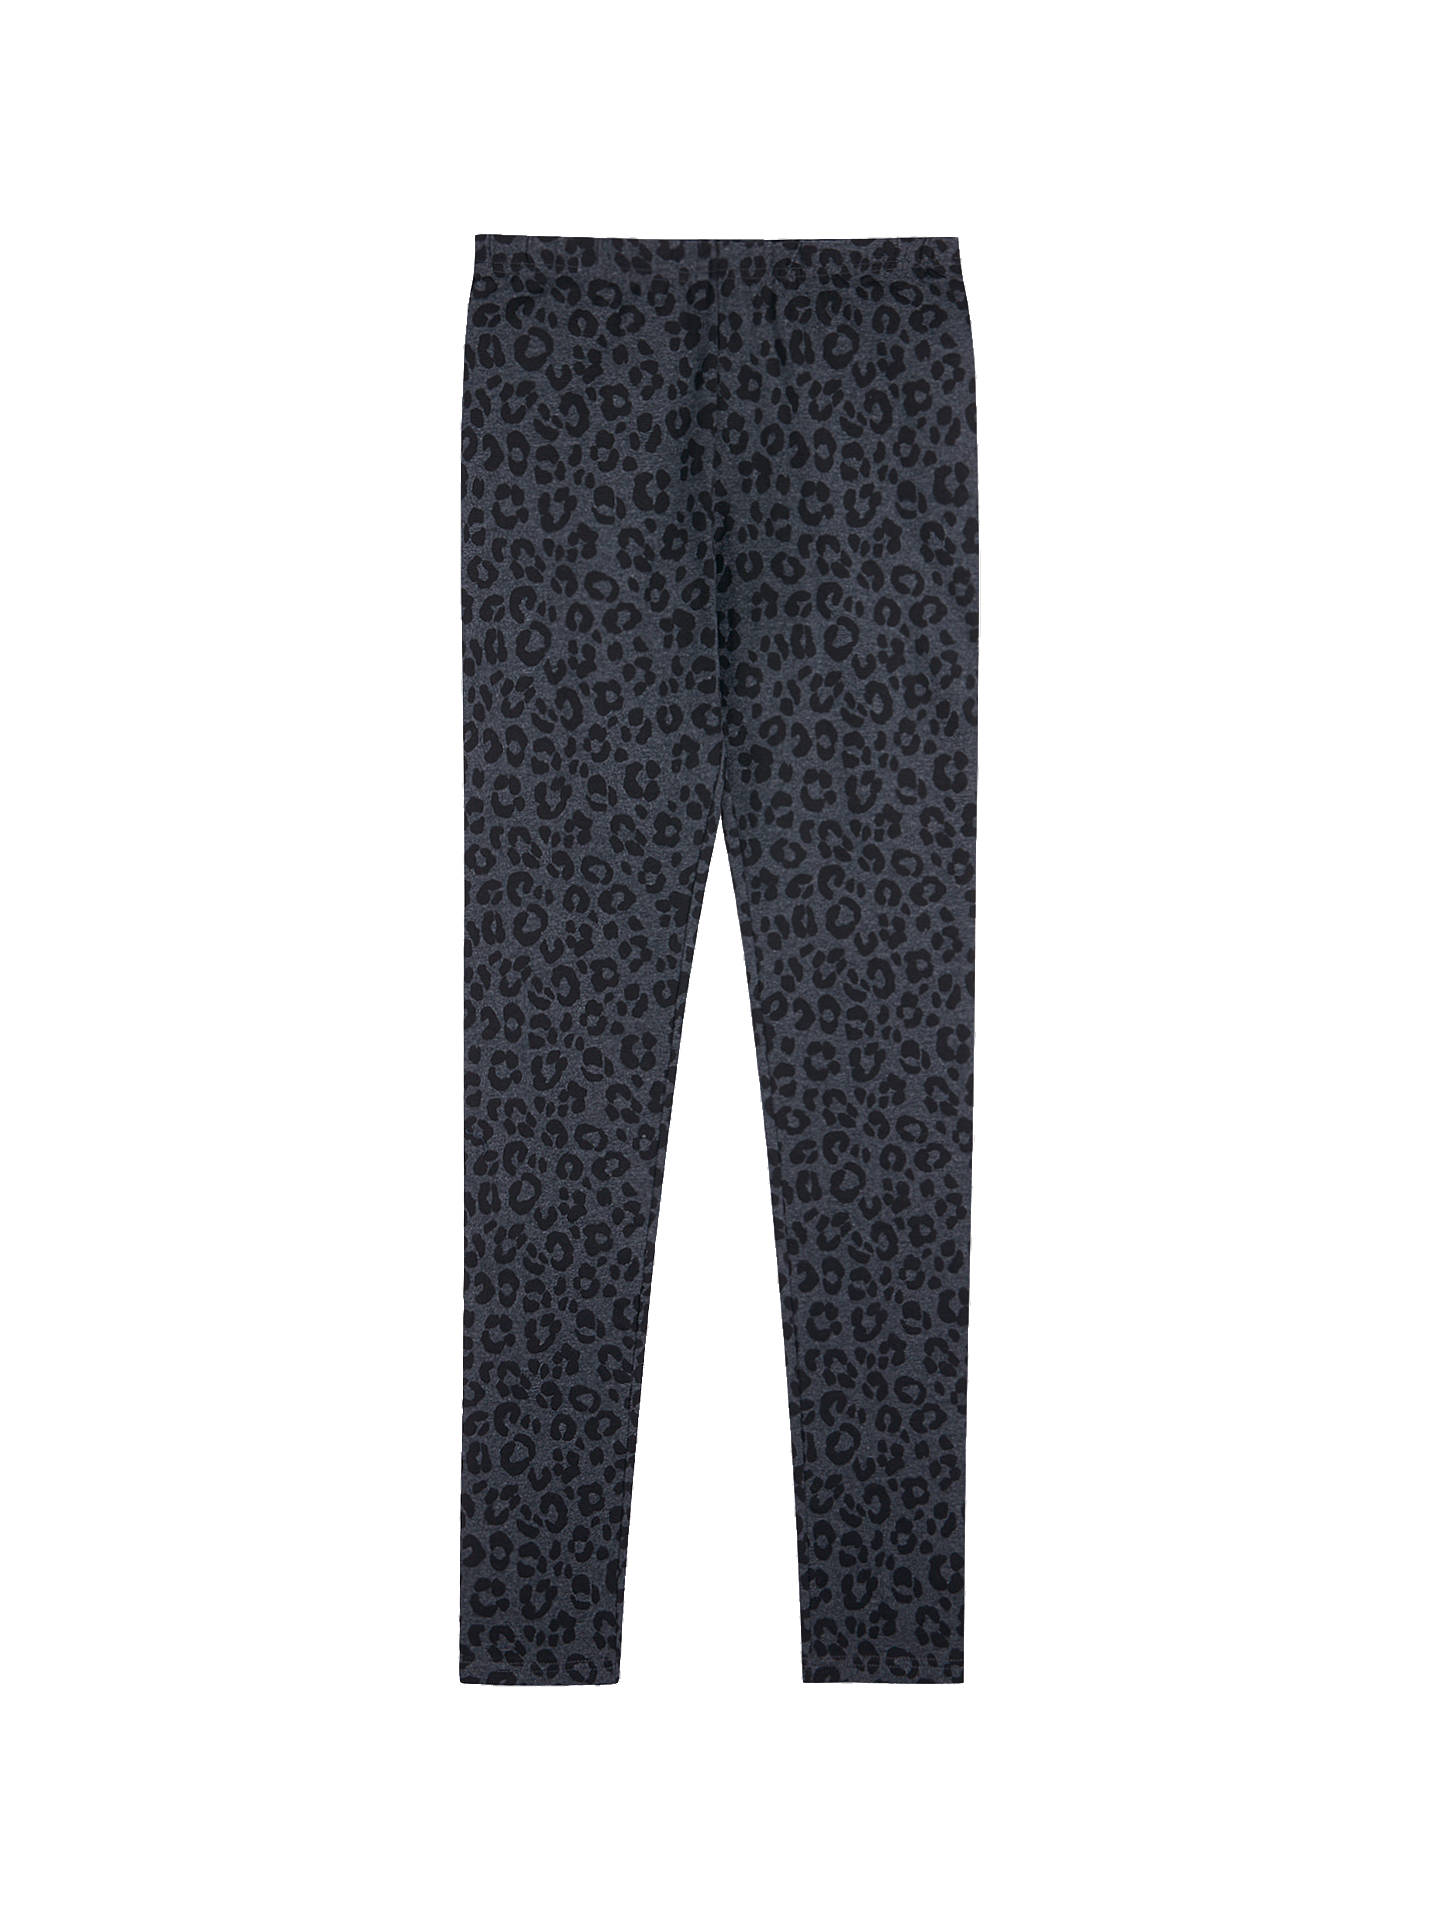 d9edda6d969901 ... Buy hush Leopard Printed Leggings, Black, XS Online at johnlewis.com